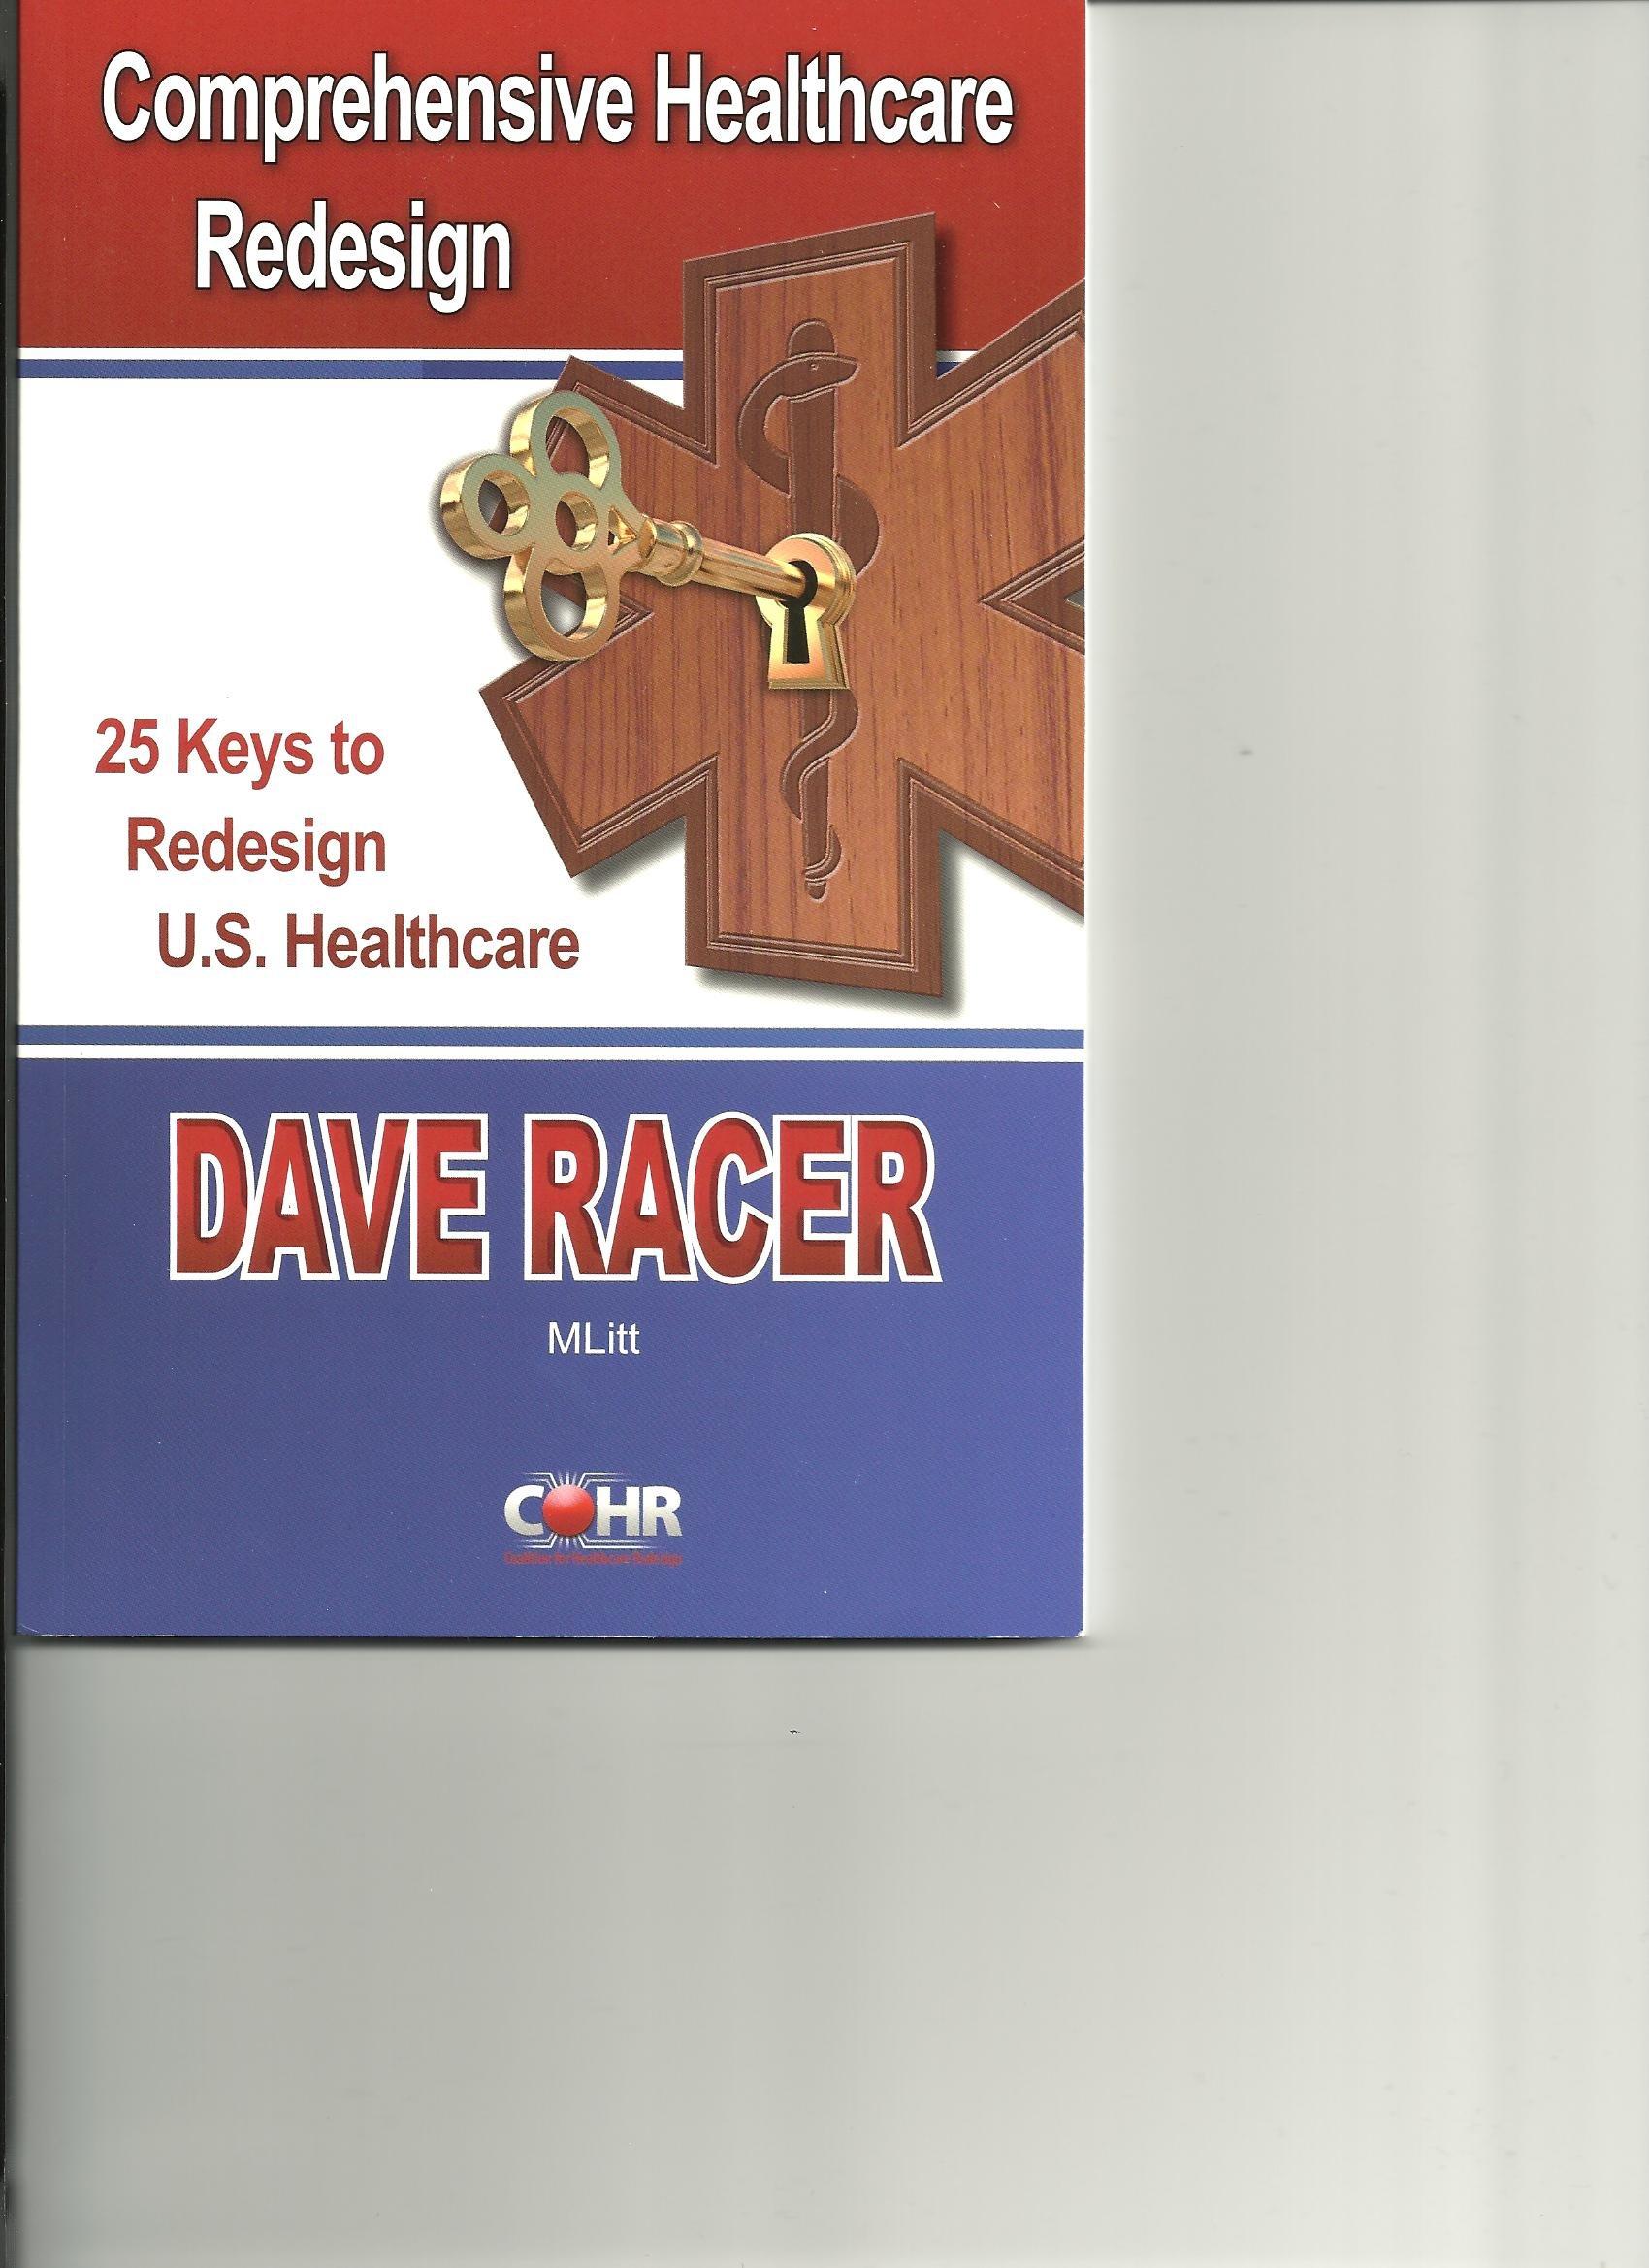 Download 25 Keys to Redesign U.S. Healthcare PDF